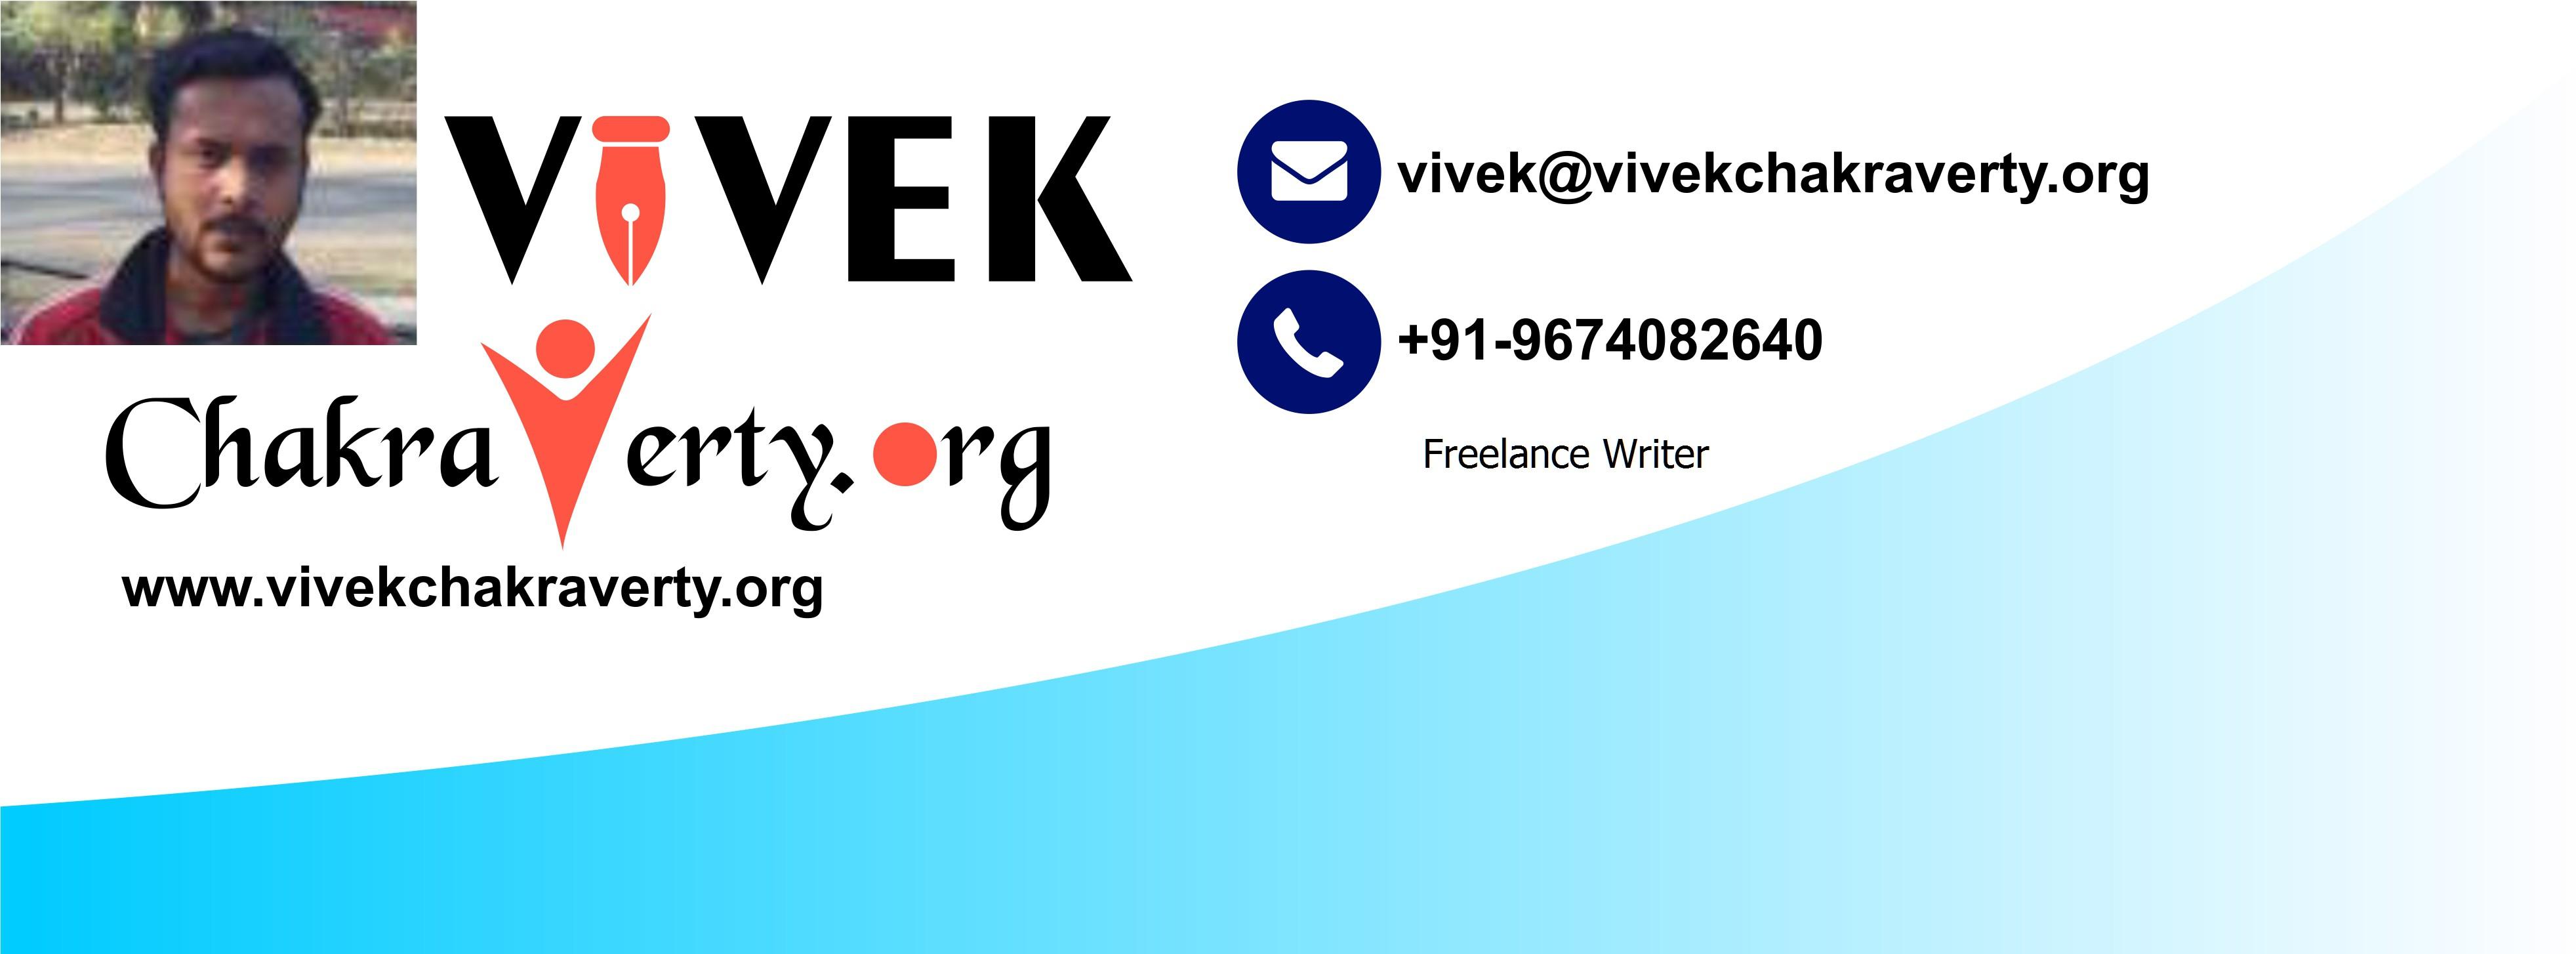 Vivek Chakraverty Banner